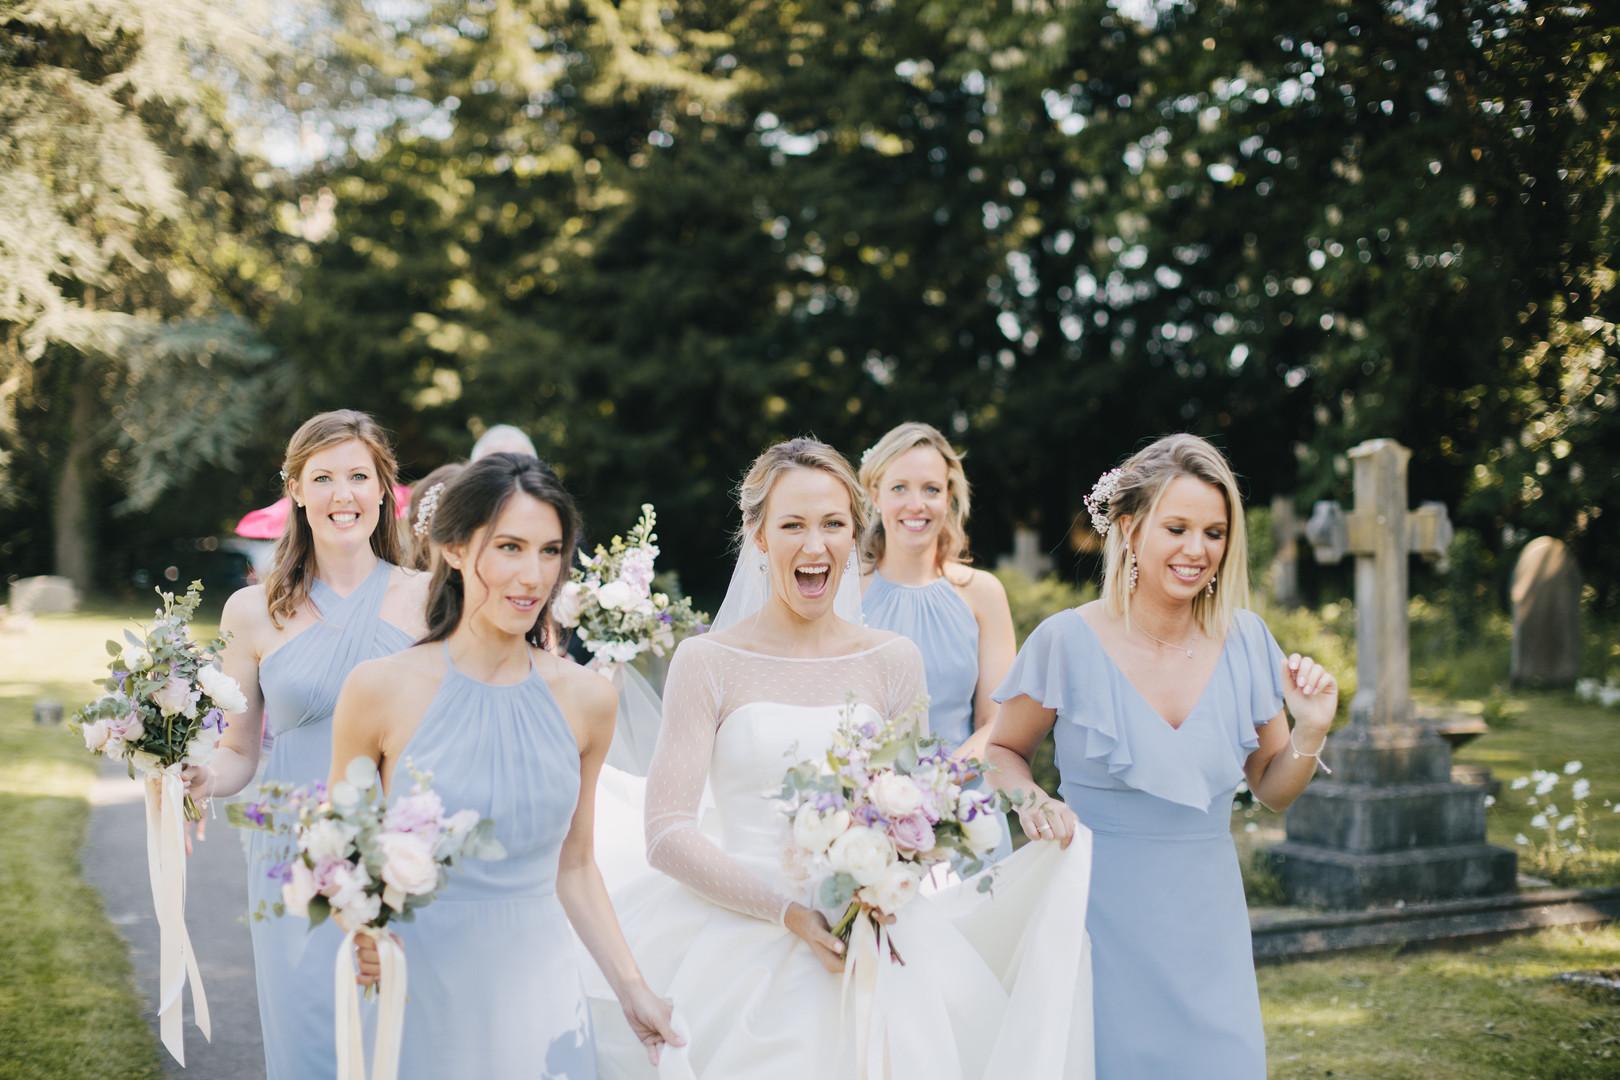 Sarah-and-Ned-Wedding-186.jpg